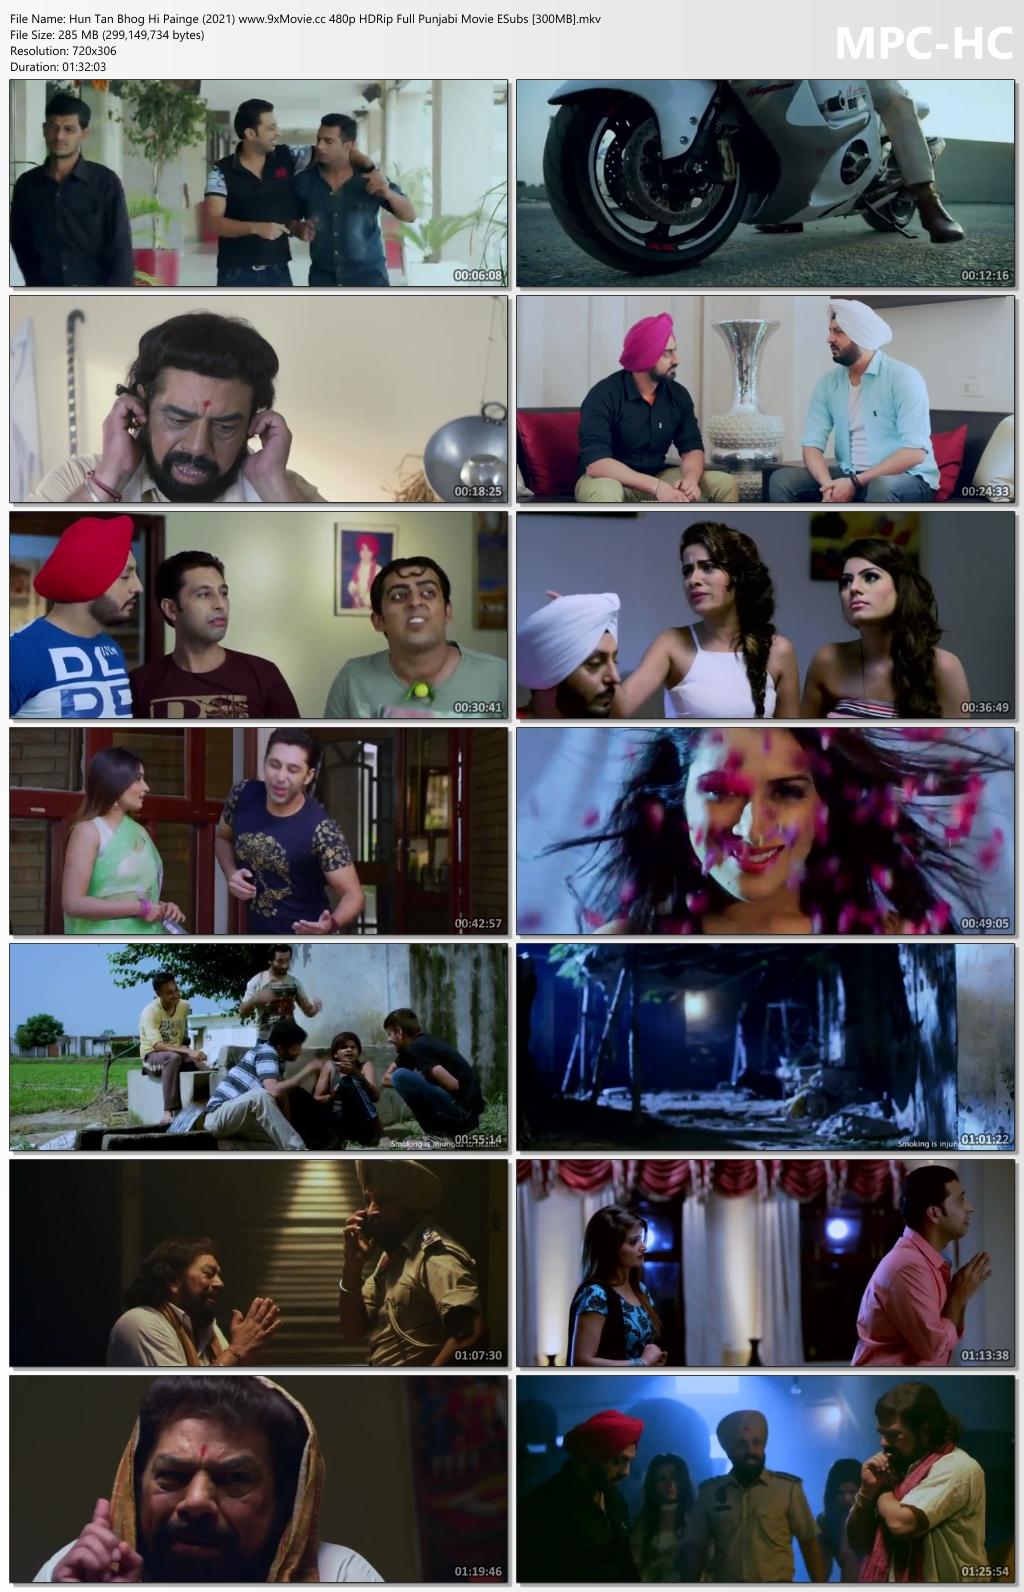 Hun-Tan-Bhog-Hi-Painge-2021-www-9x-Movie-cc-480p-HDRip-Full-Punjabi-Movie-ESubs-300-MB-mkv